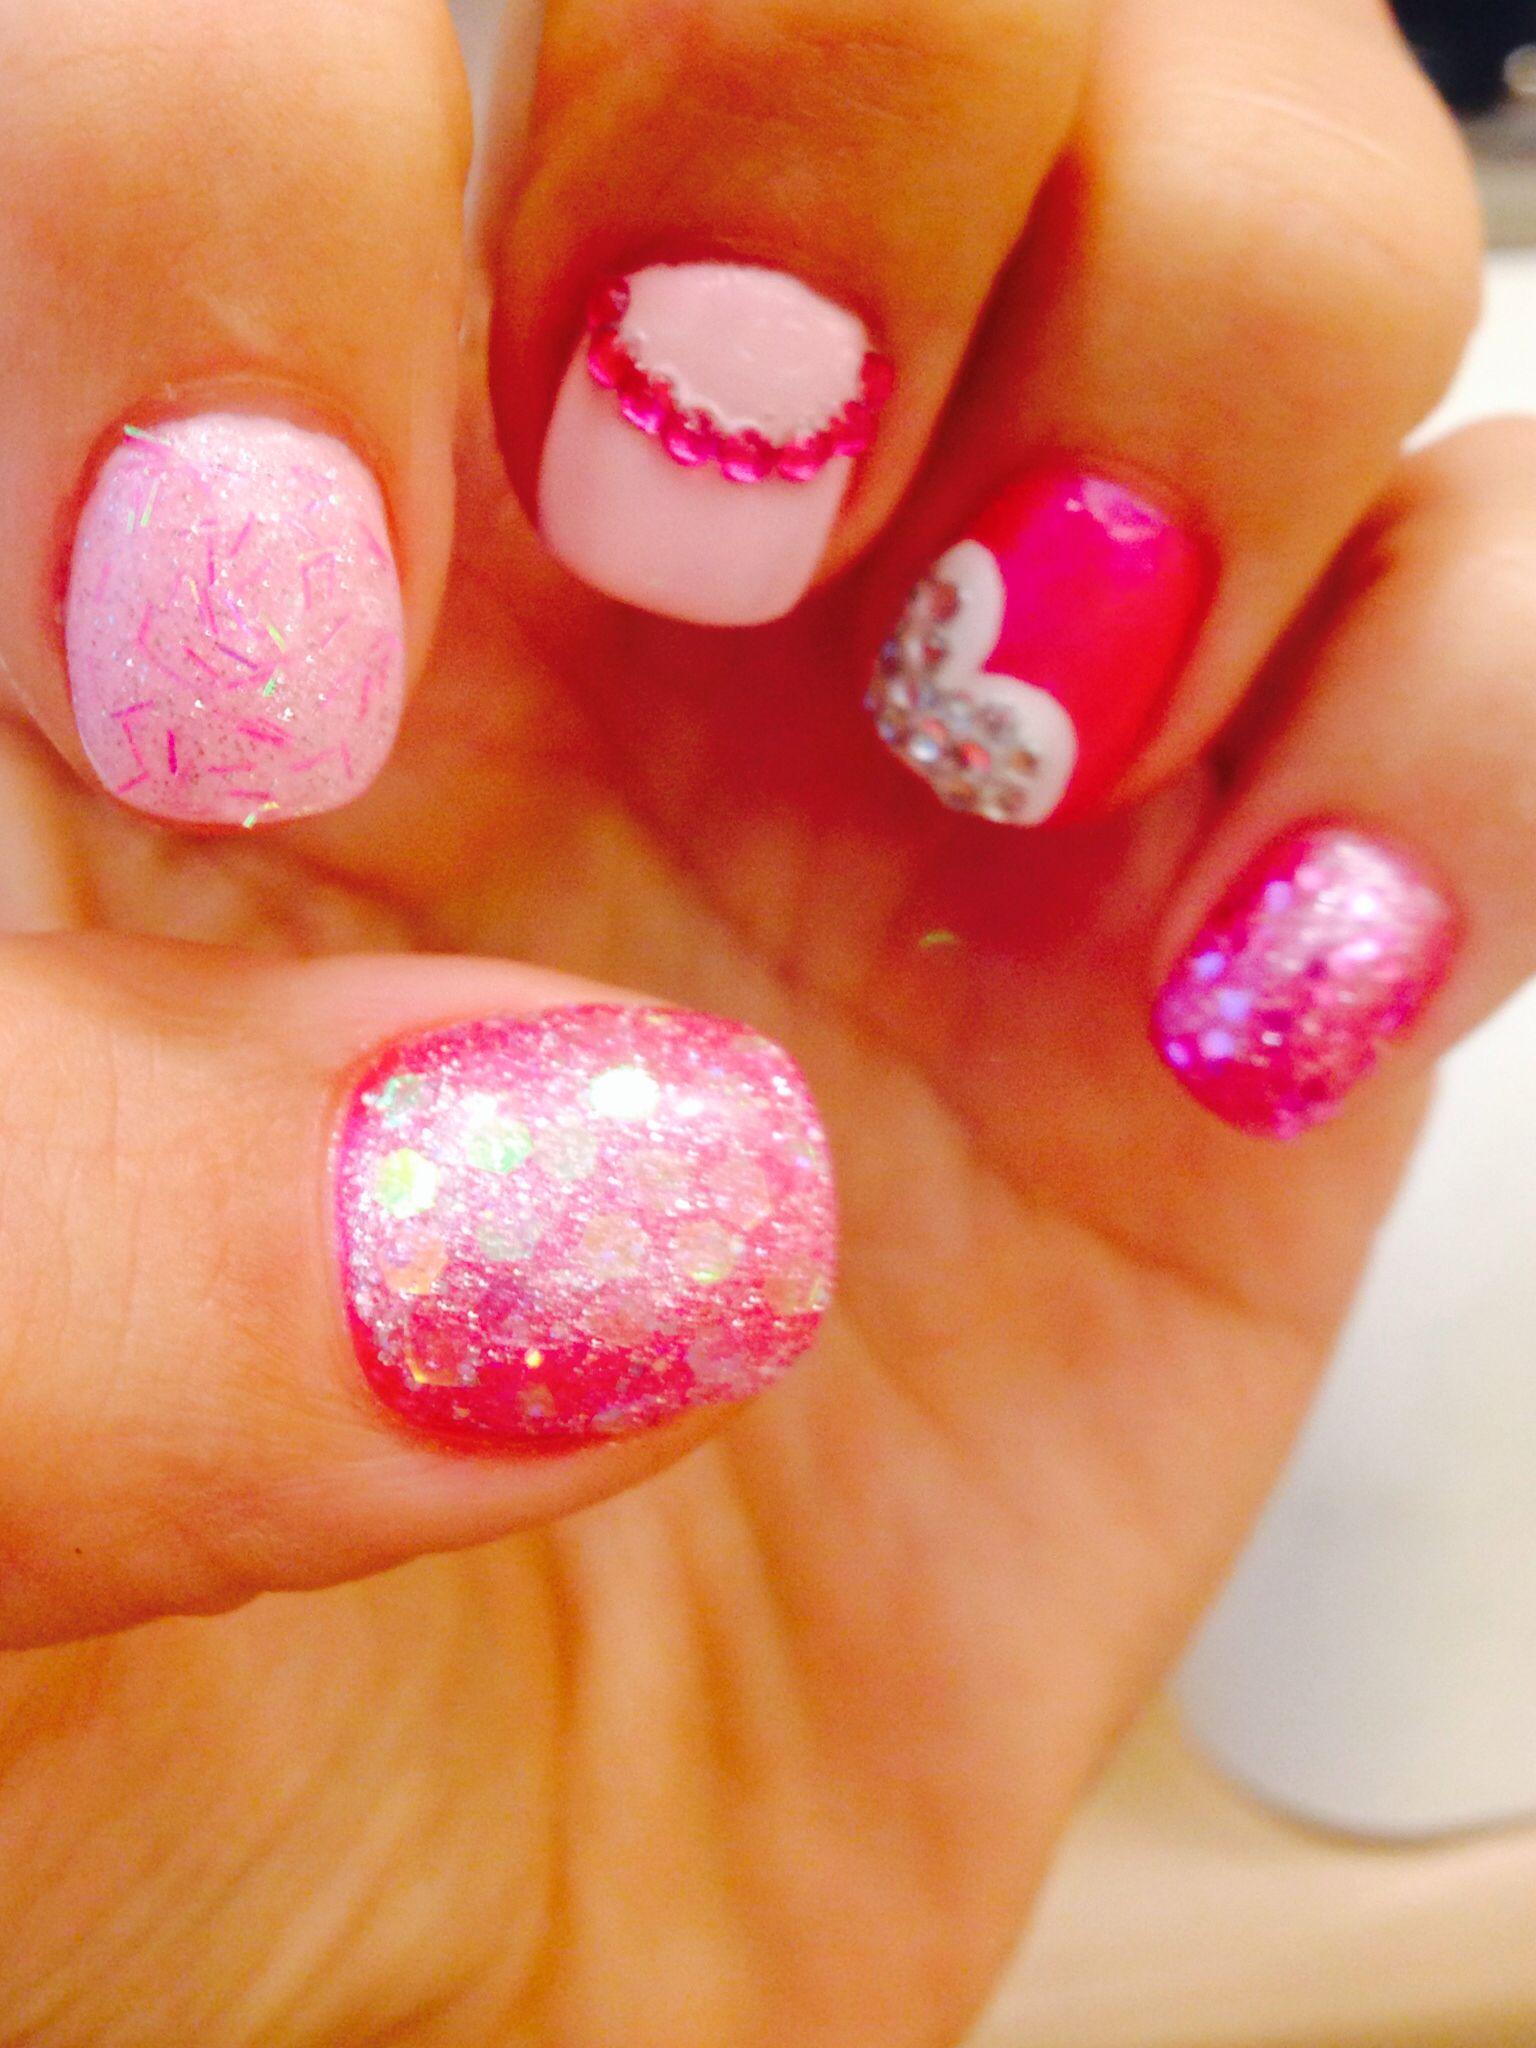 Nails by Juliet - SPARKLE OBSESSION! Lovelovelove them!